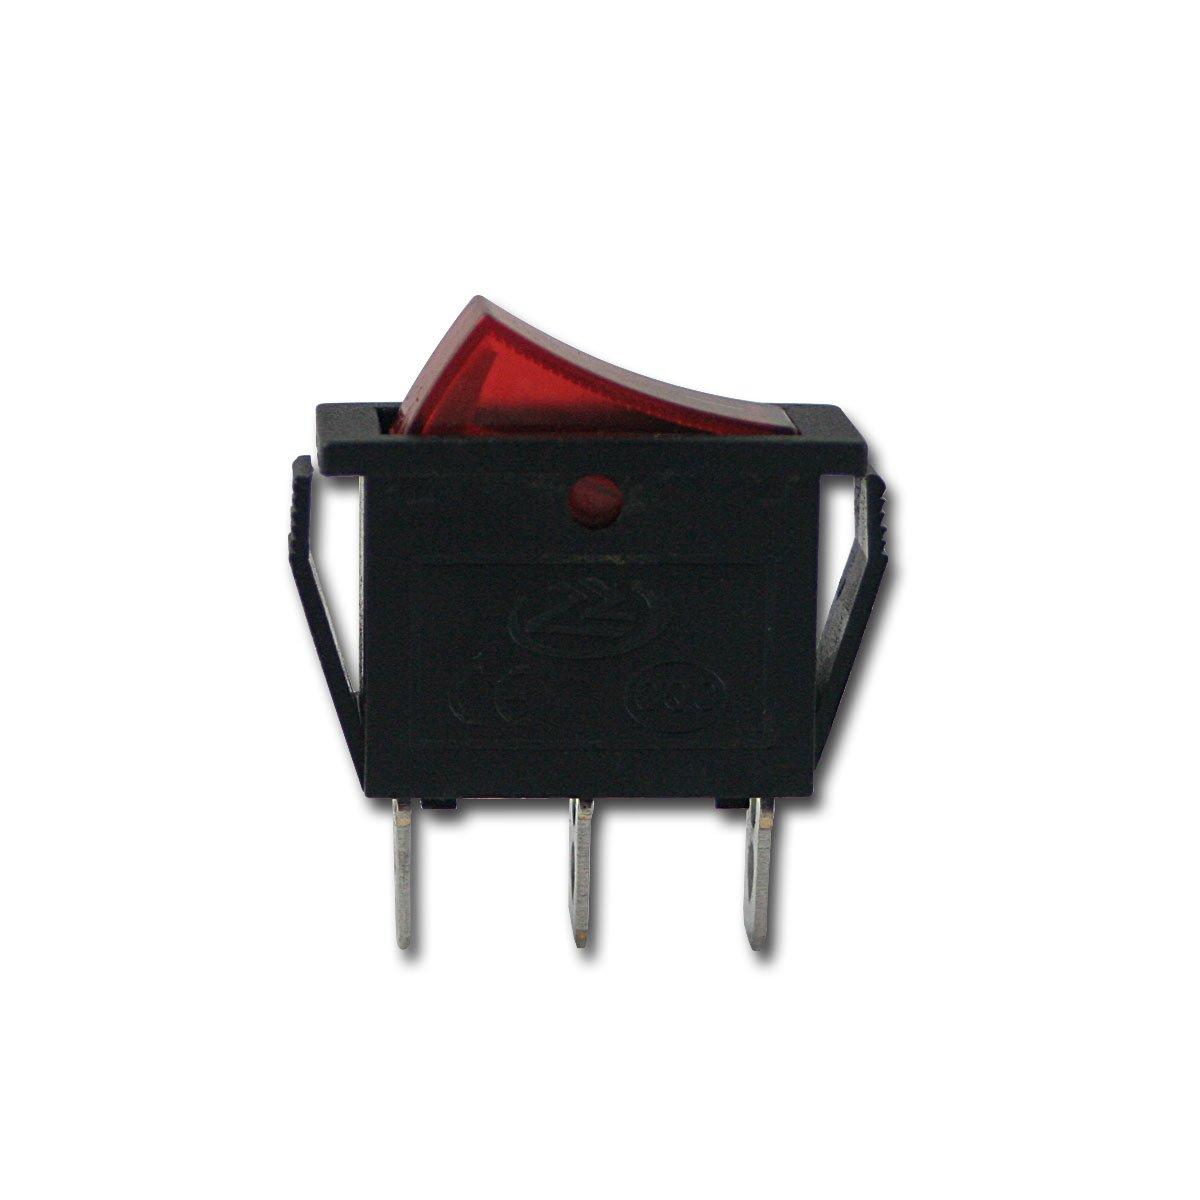 Wippschalter 1-Polig, Rote Wippe, 12V/20A Kfz: Amazon.de: Elektronik